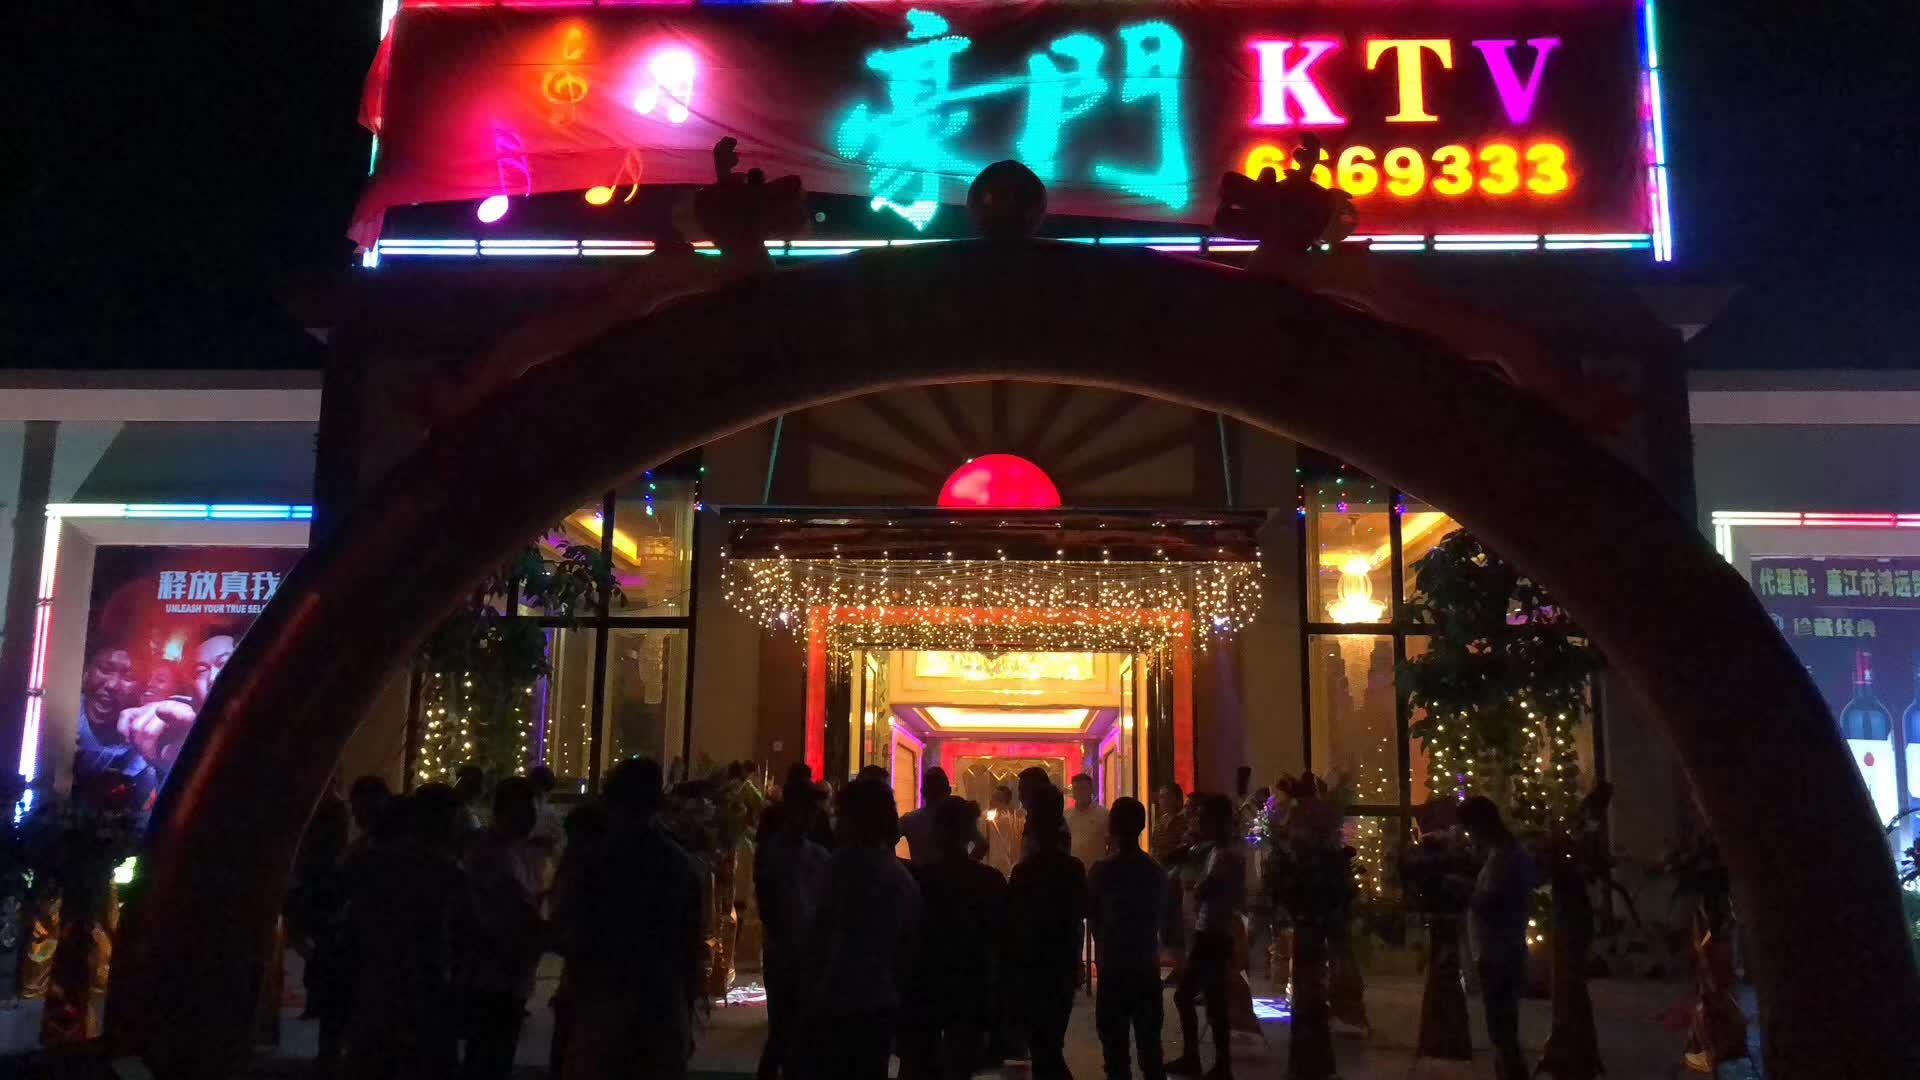 【HEVOS 娱乐KTV案例分享】音乐我主宰——湛江豪门KTV俱乐部